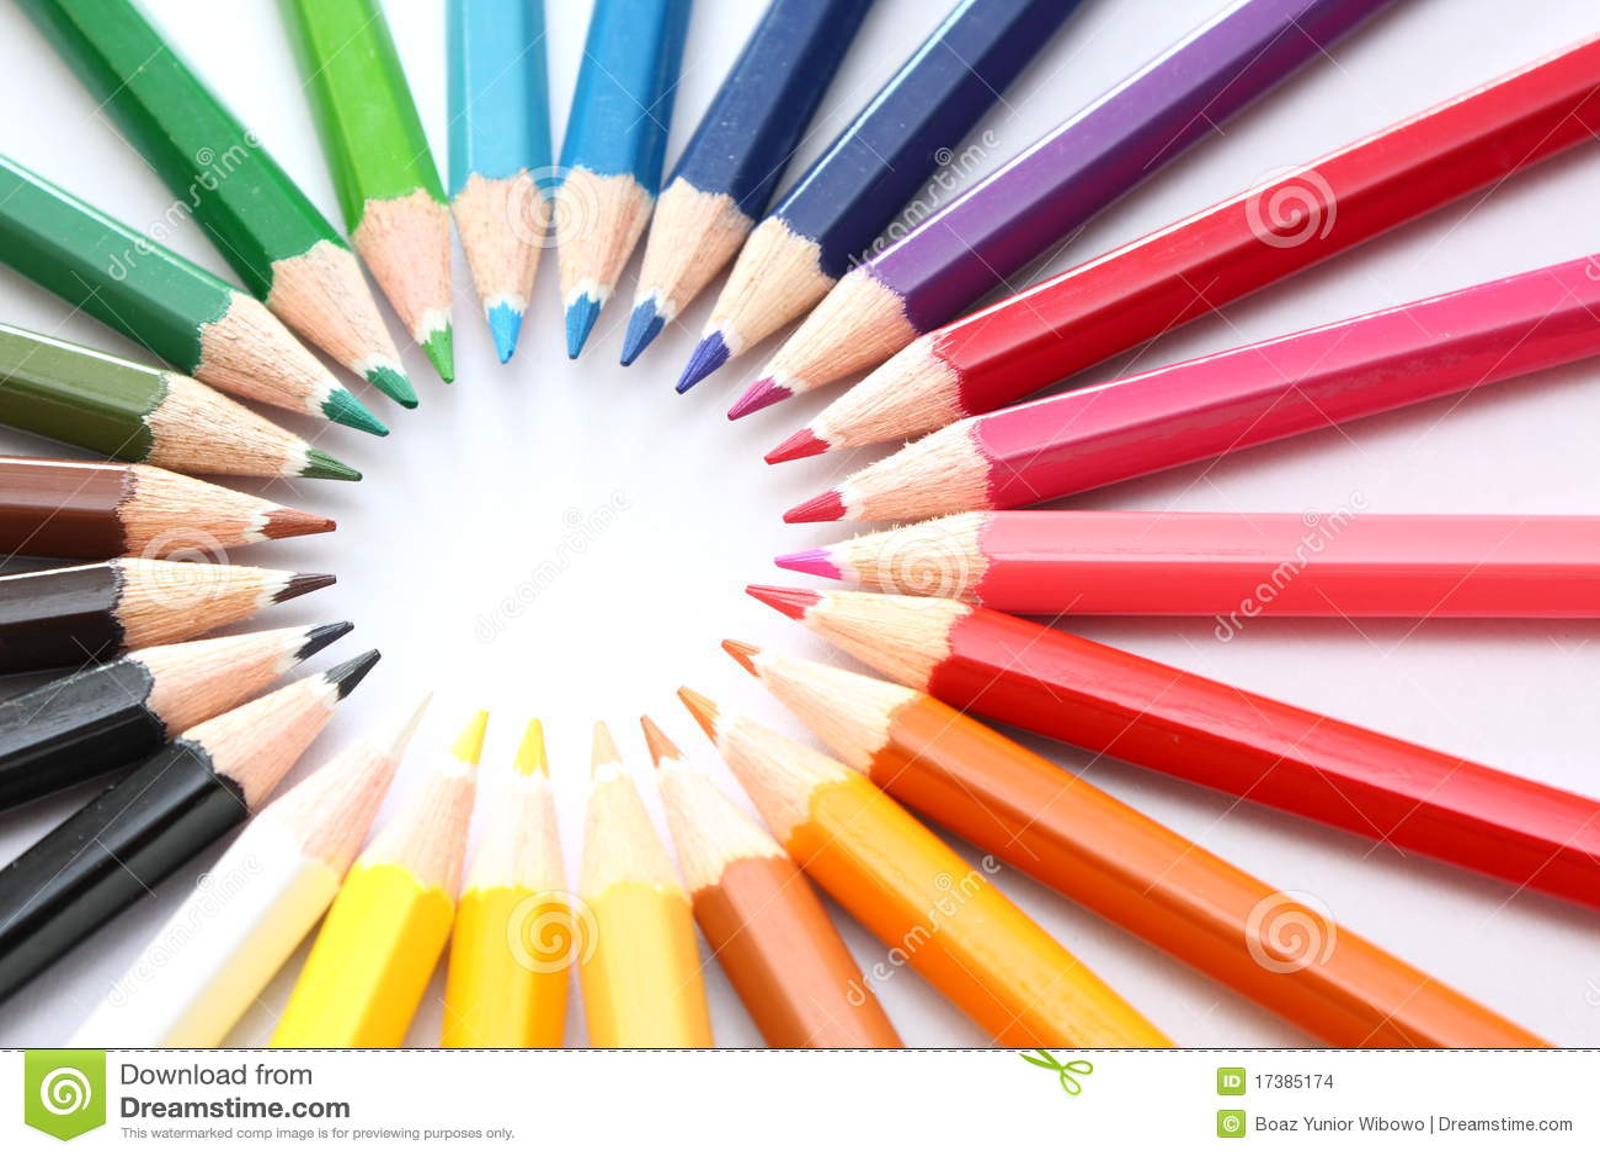 Groep potloden